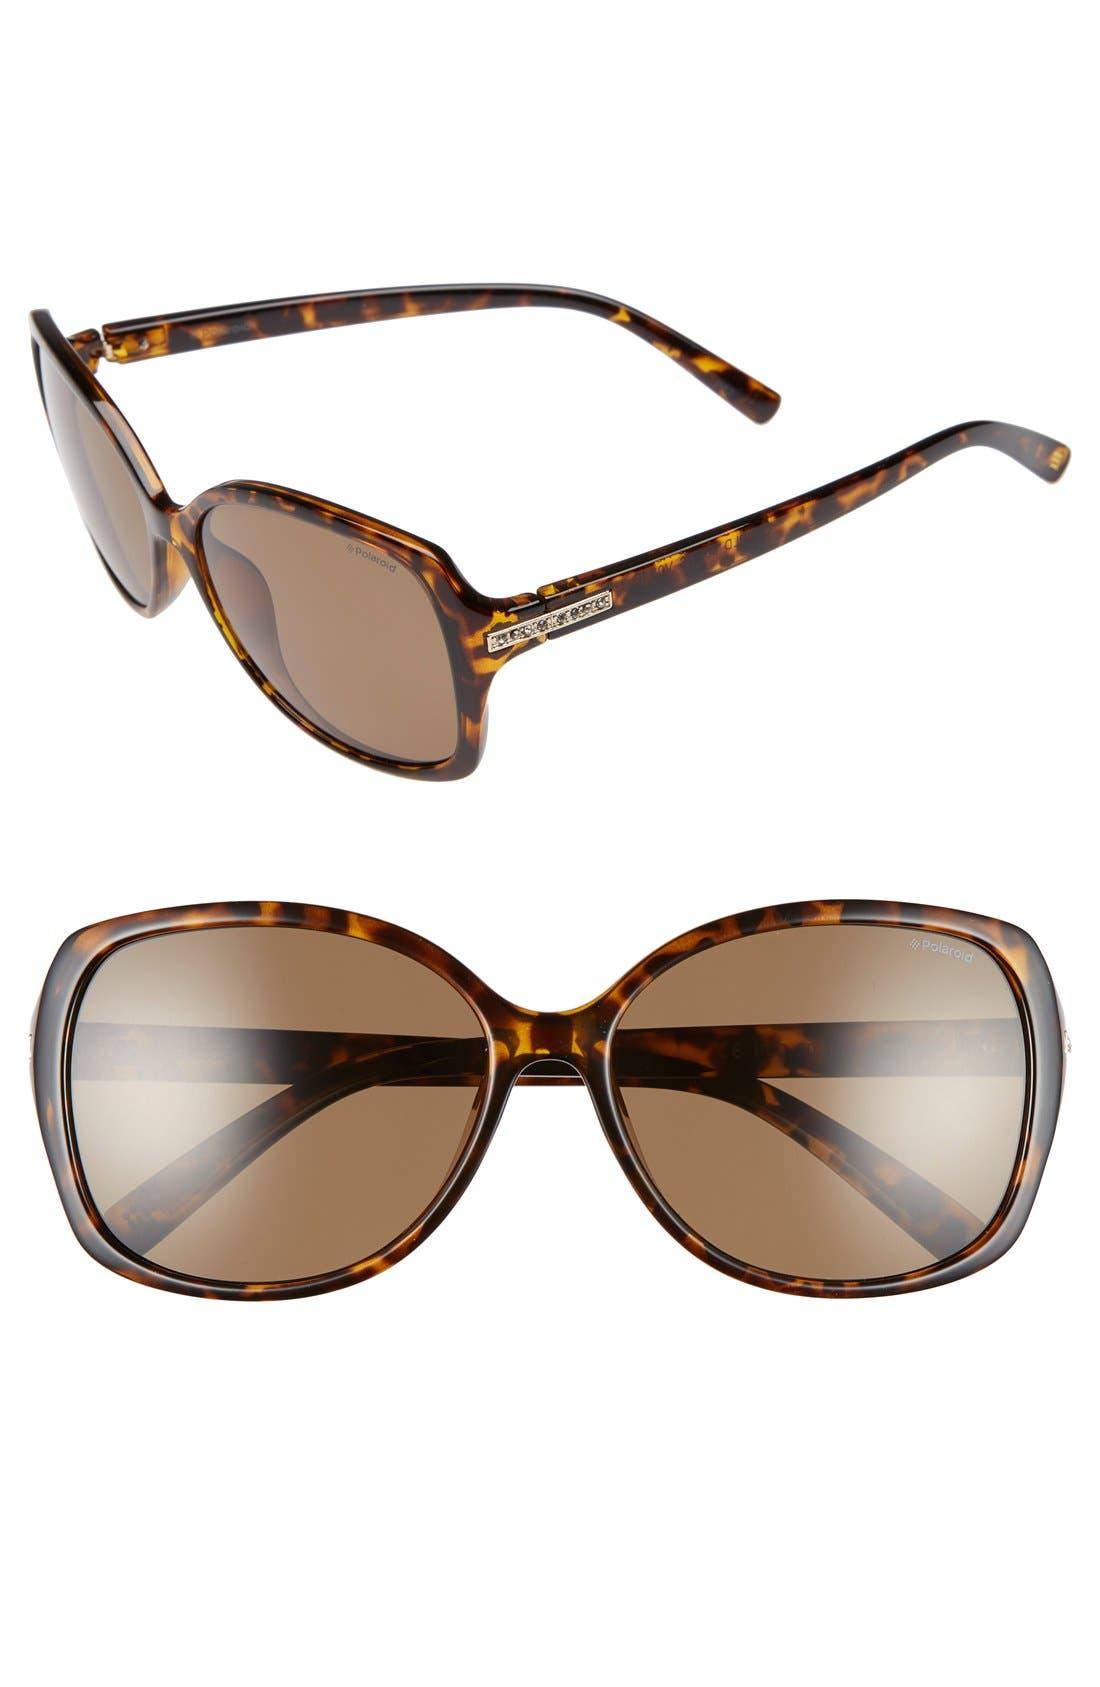 Main Image - Polaroid 58mm Polarized Sunglasses